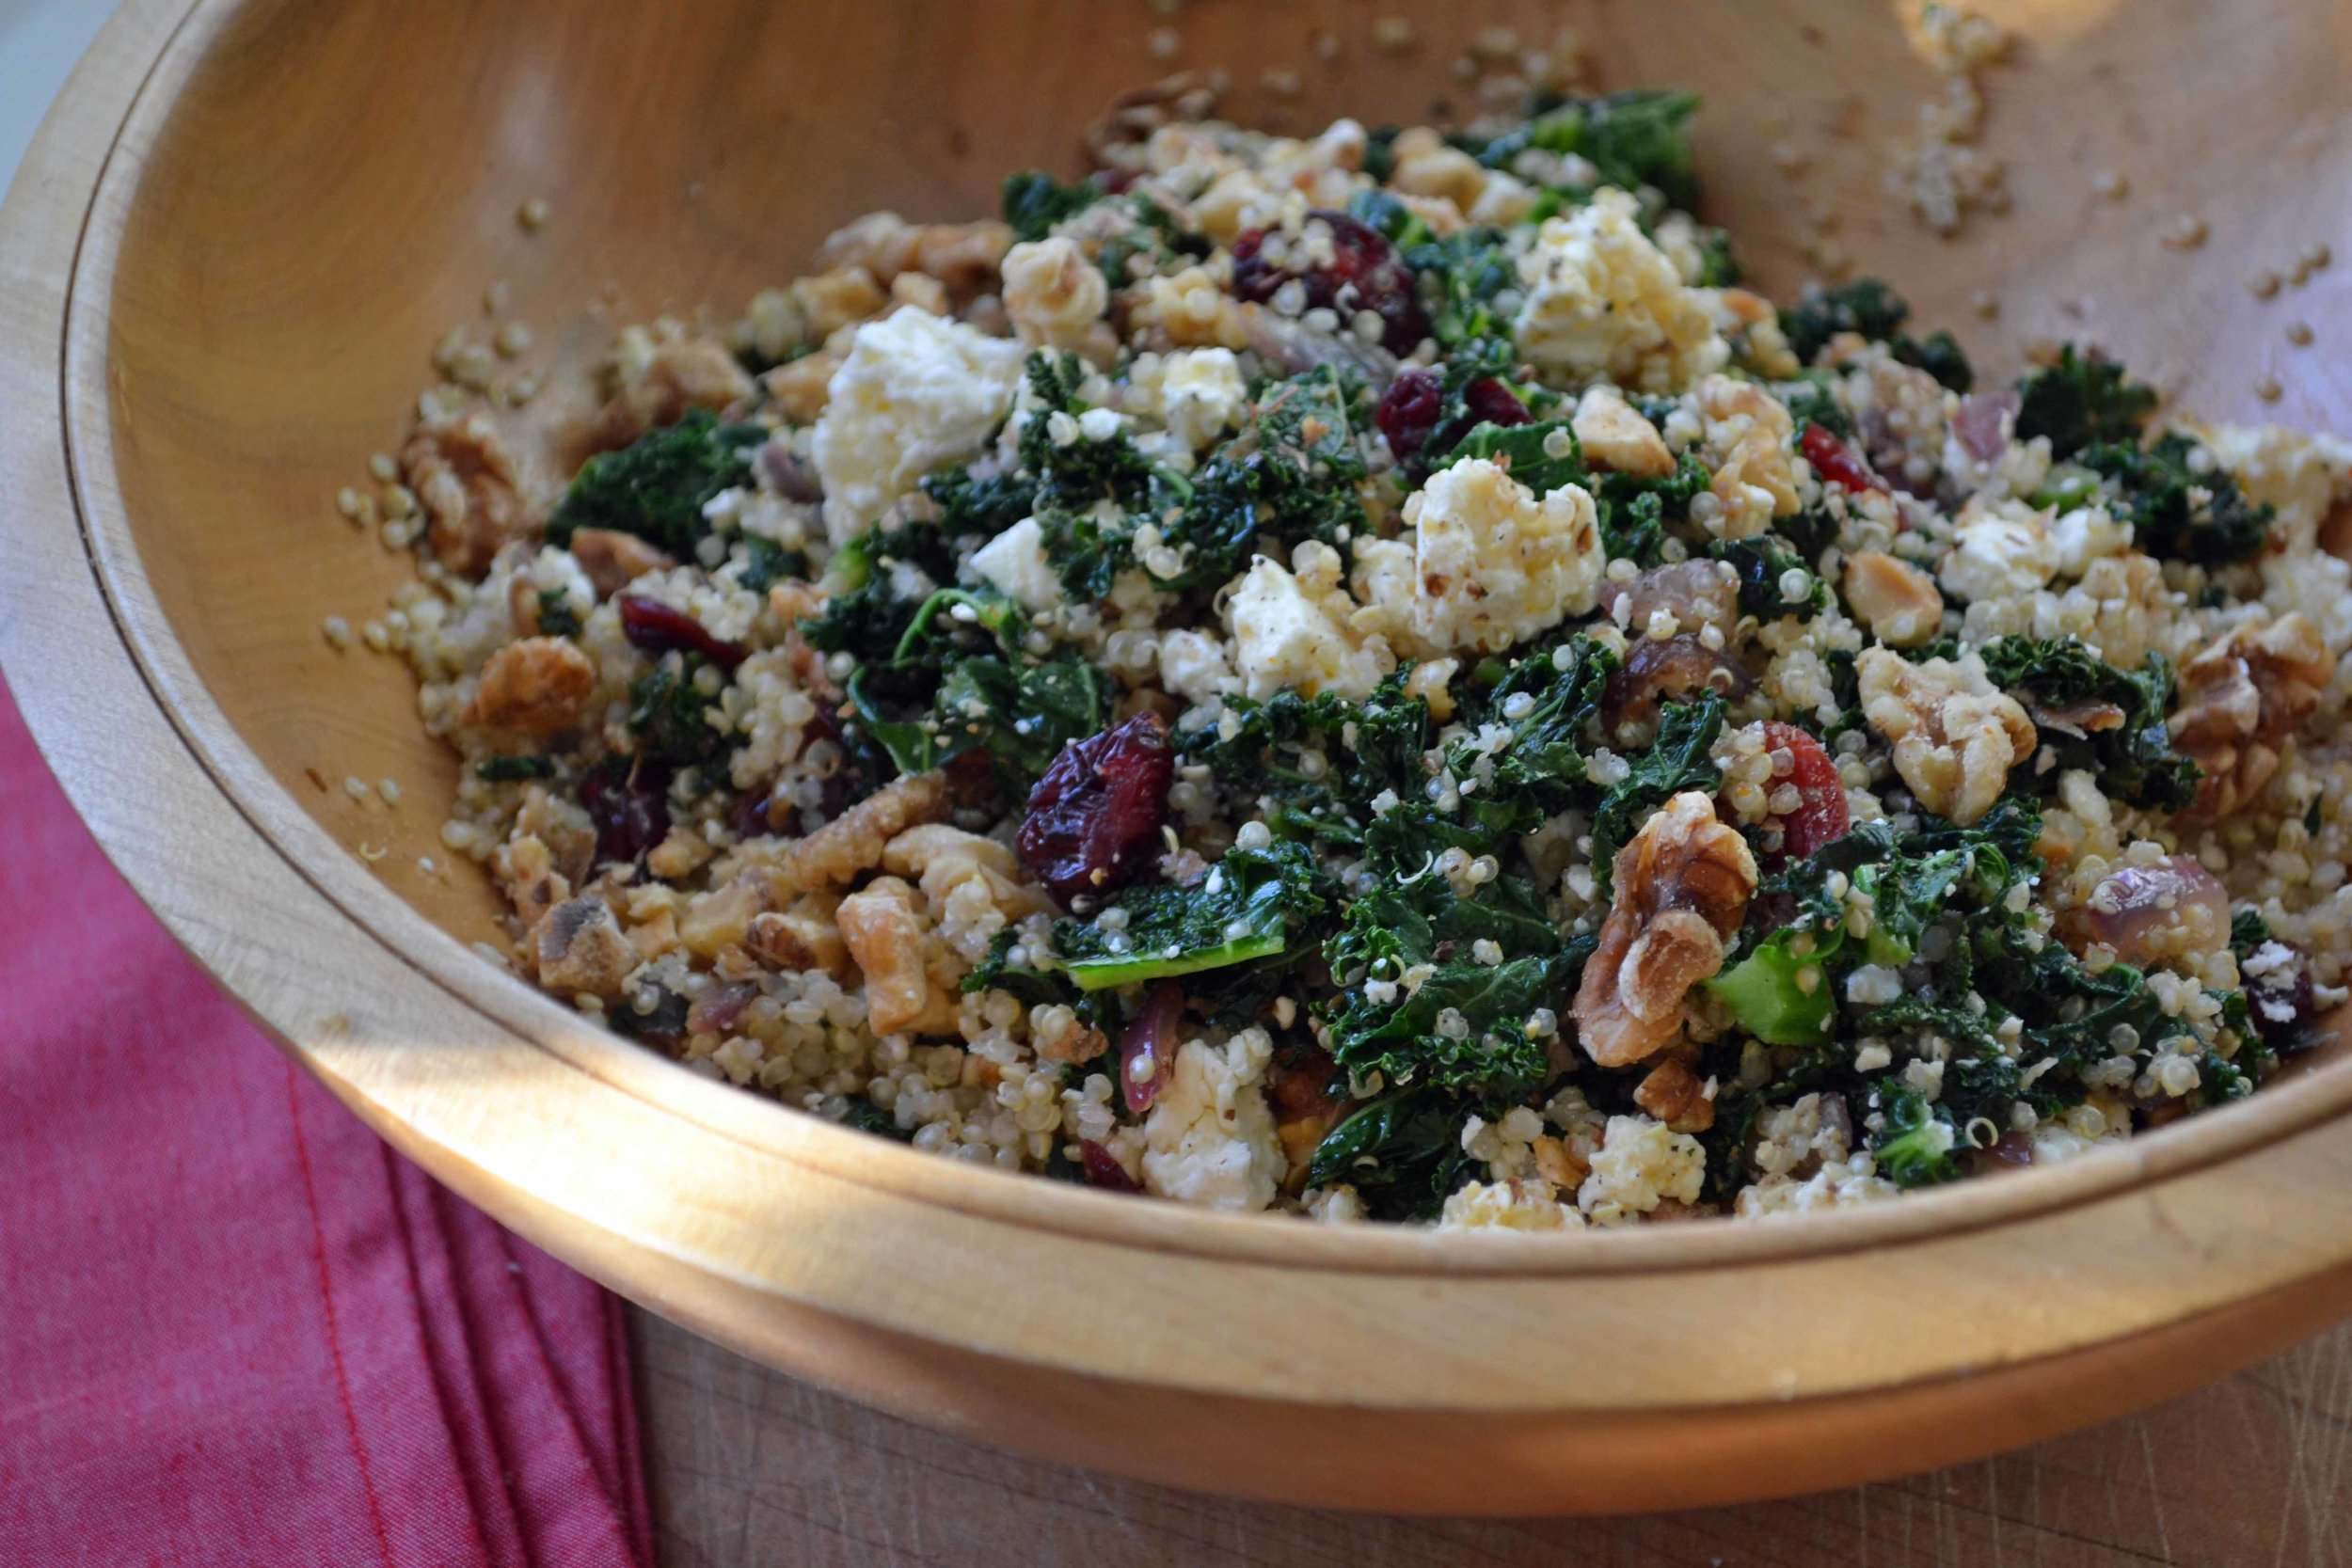 Nourish's Kale Salad